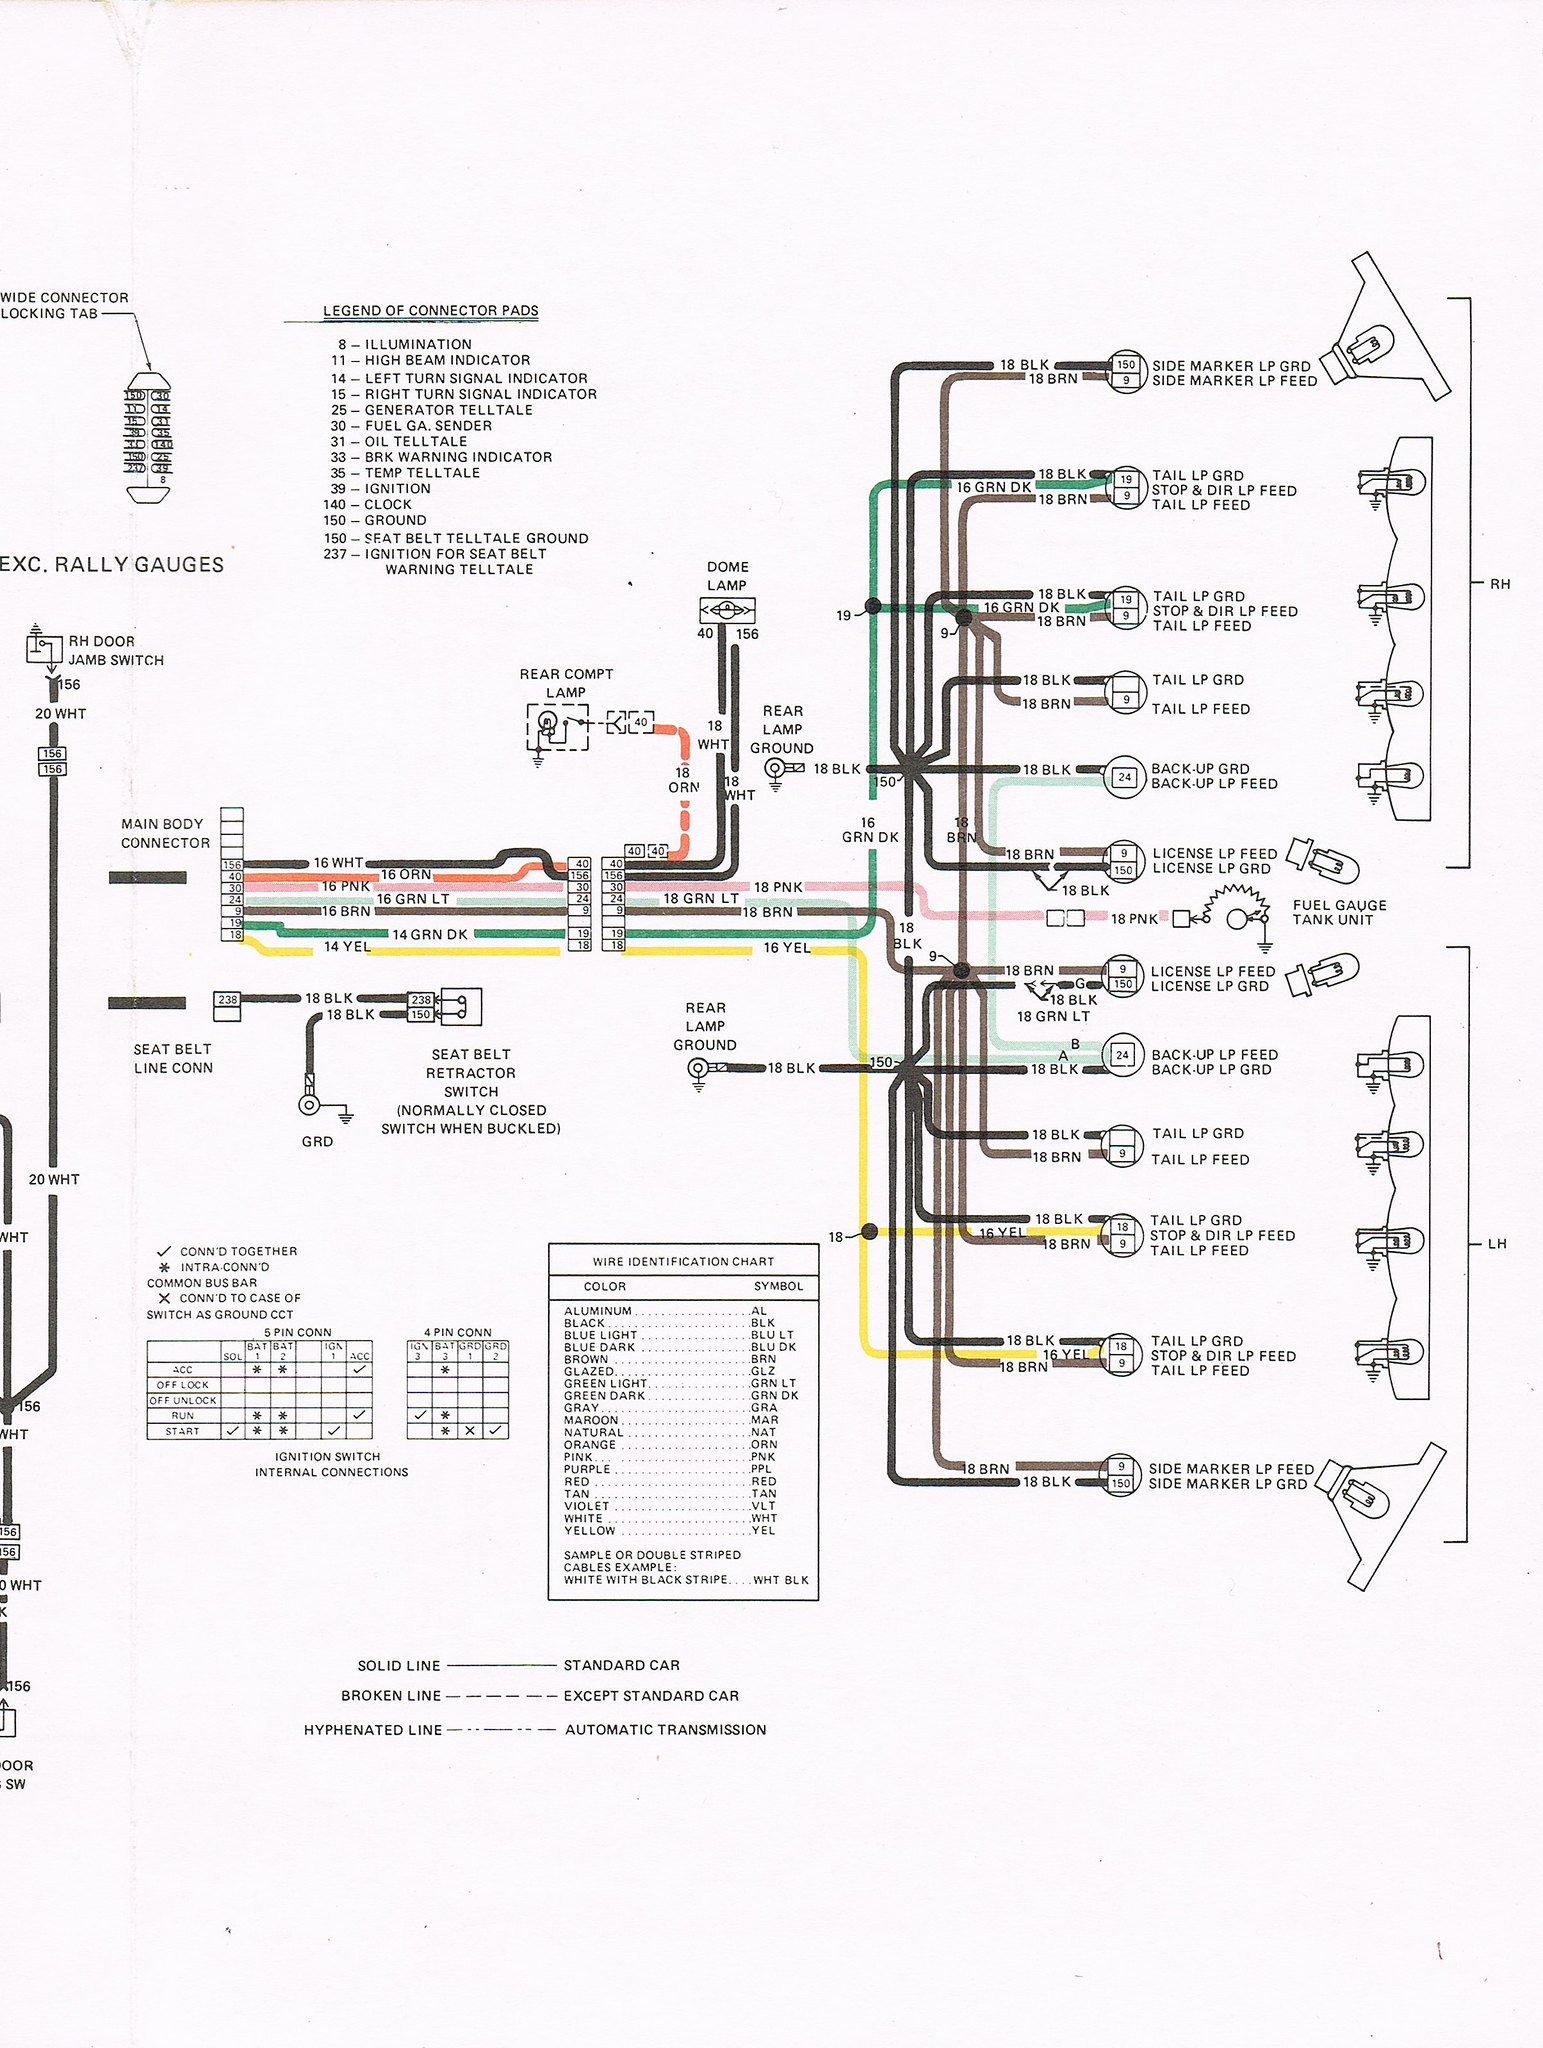 68 firebird wiring diagram ford glow plug relay camaro fuse box 18 images